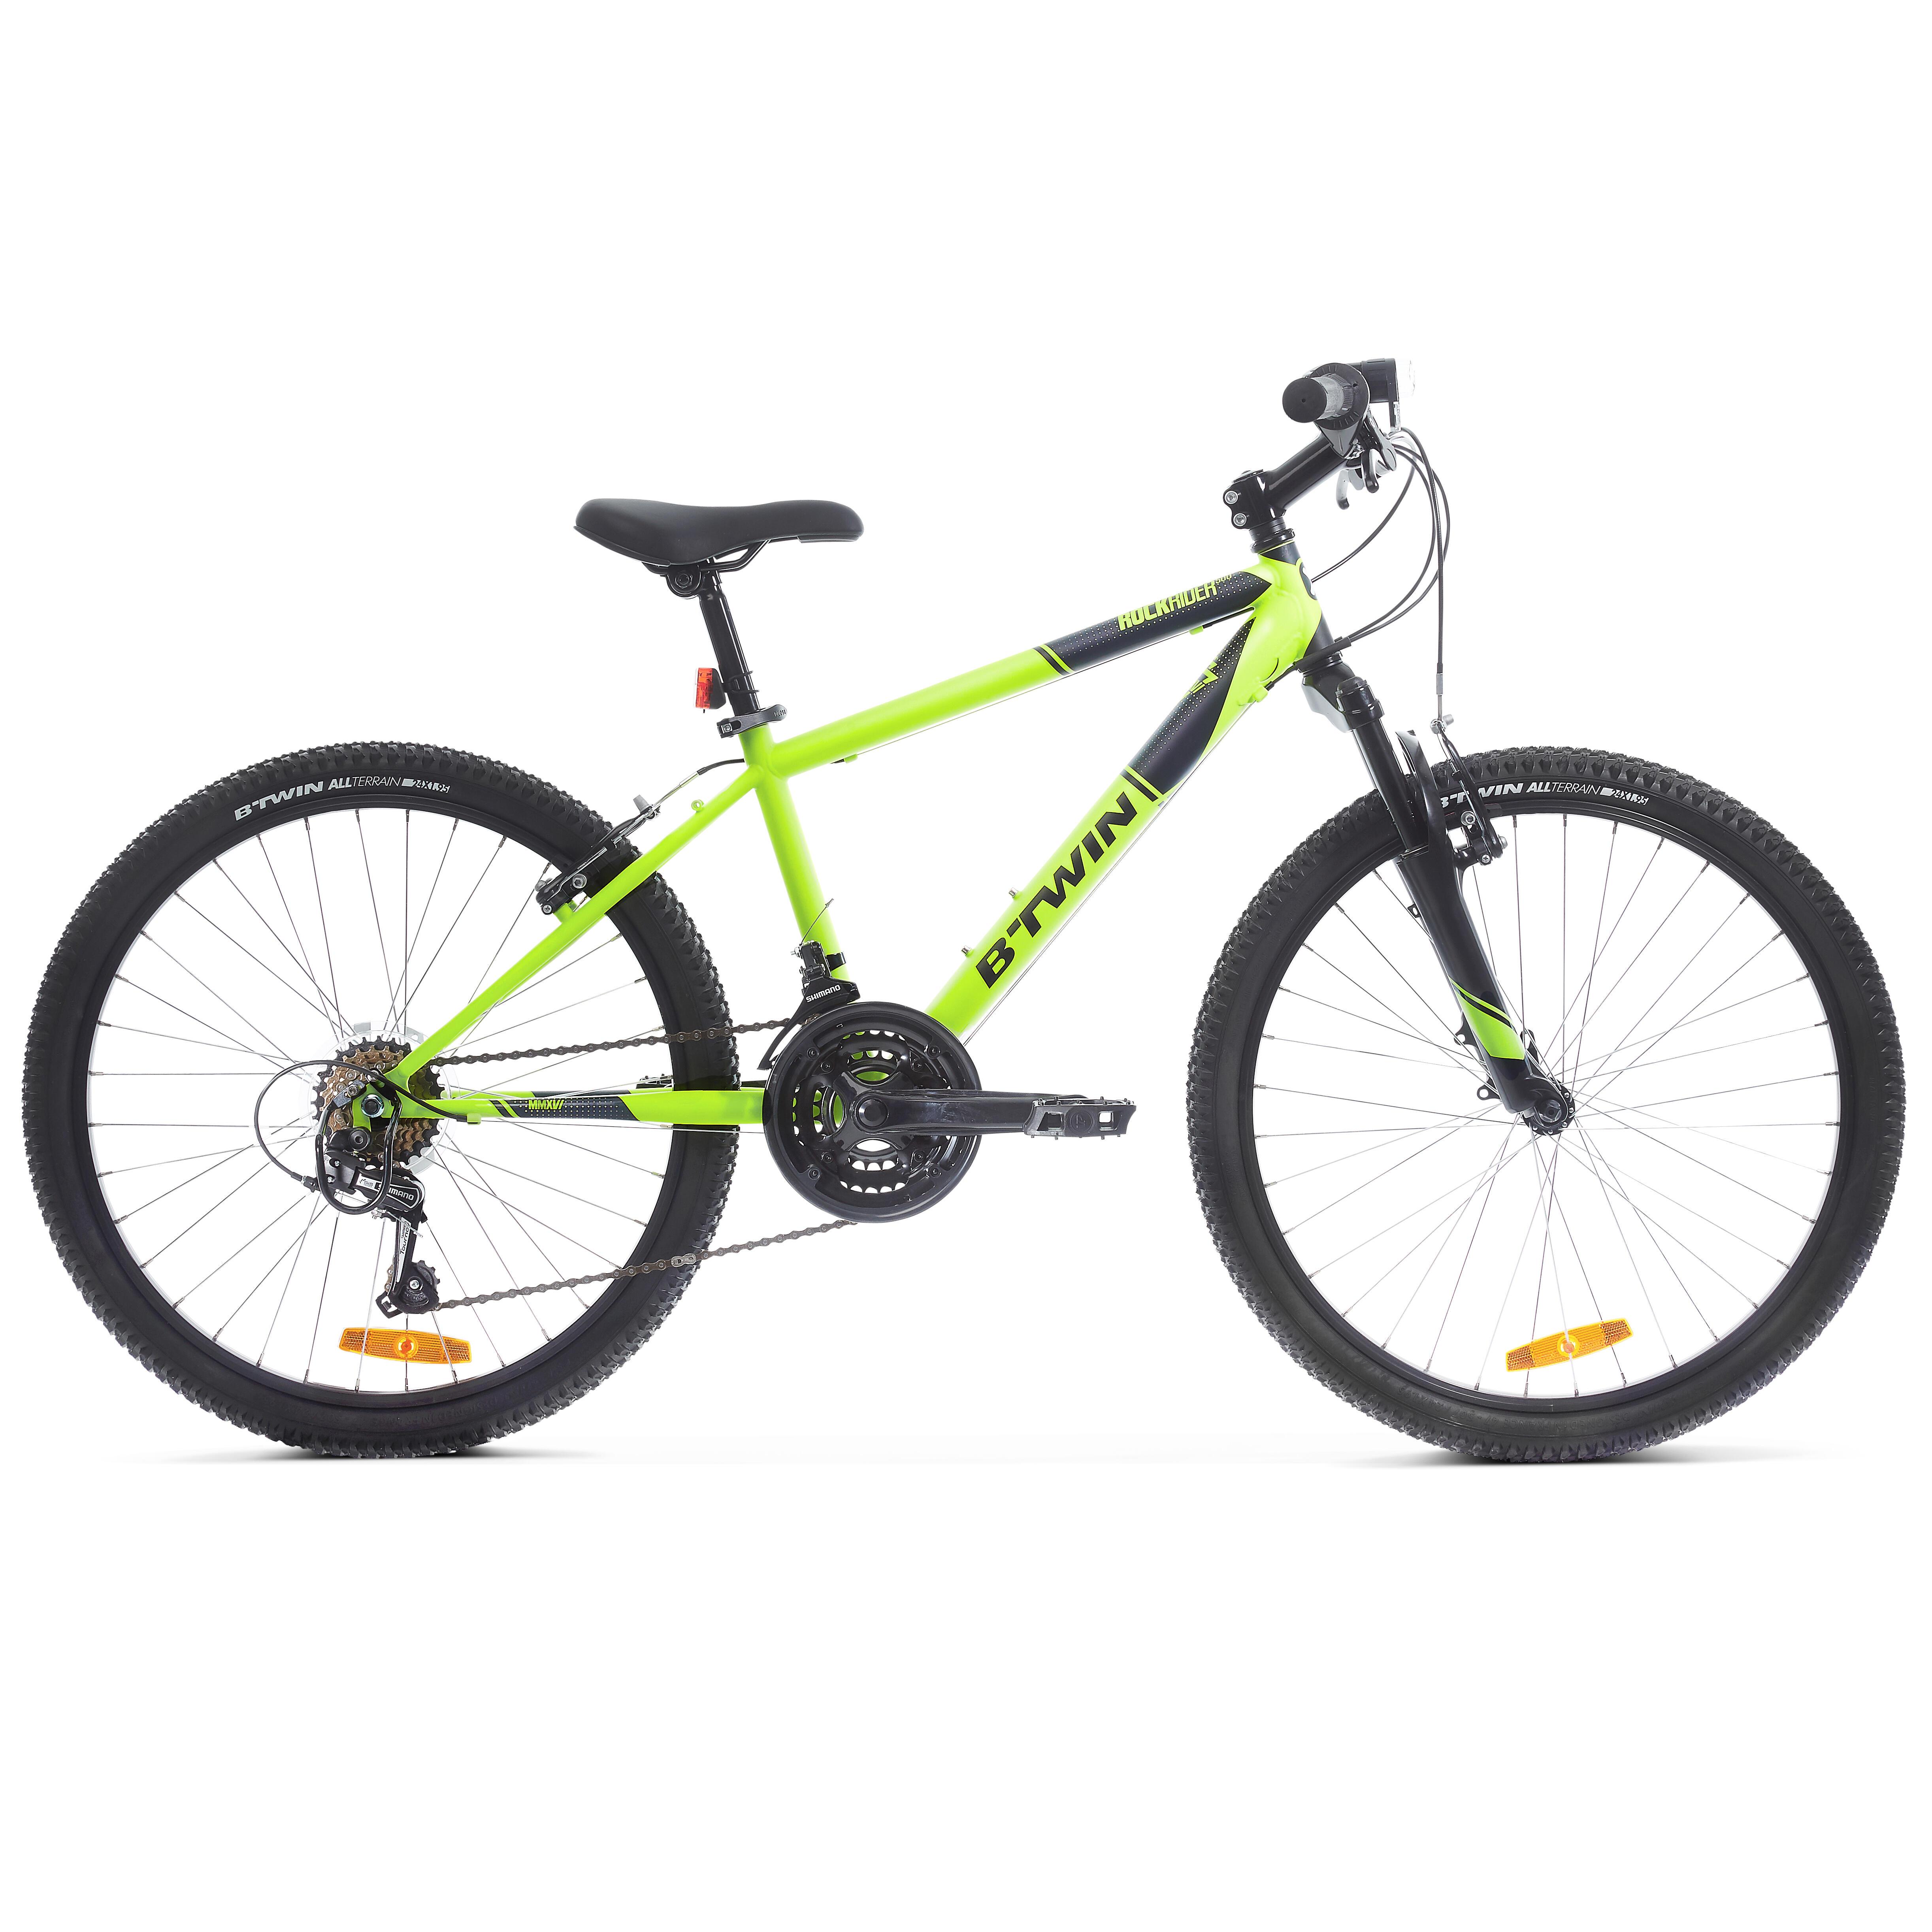 B'twin Kinder mountainbike Rockrider 500 24 inch jongensfiets 1.35 tot 1.50m